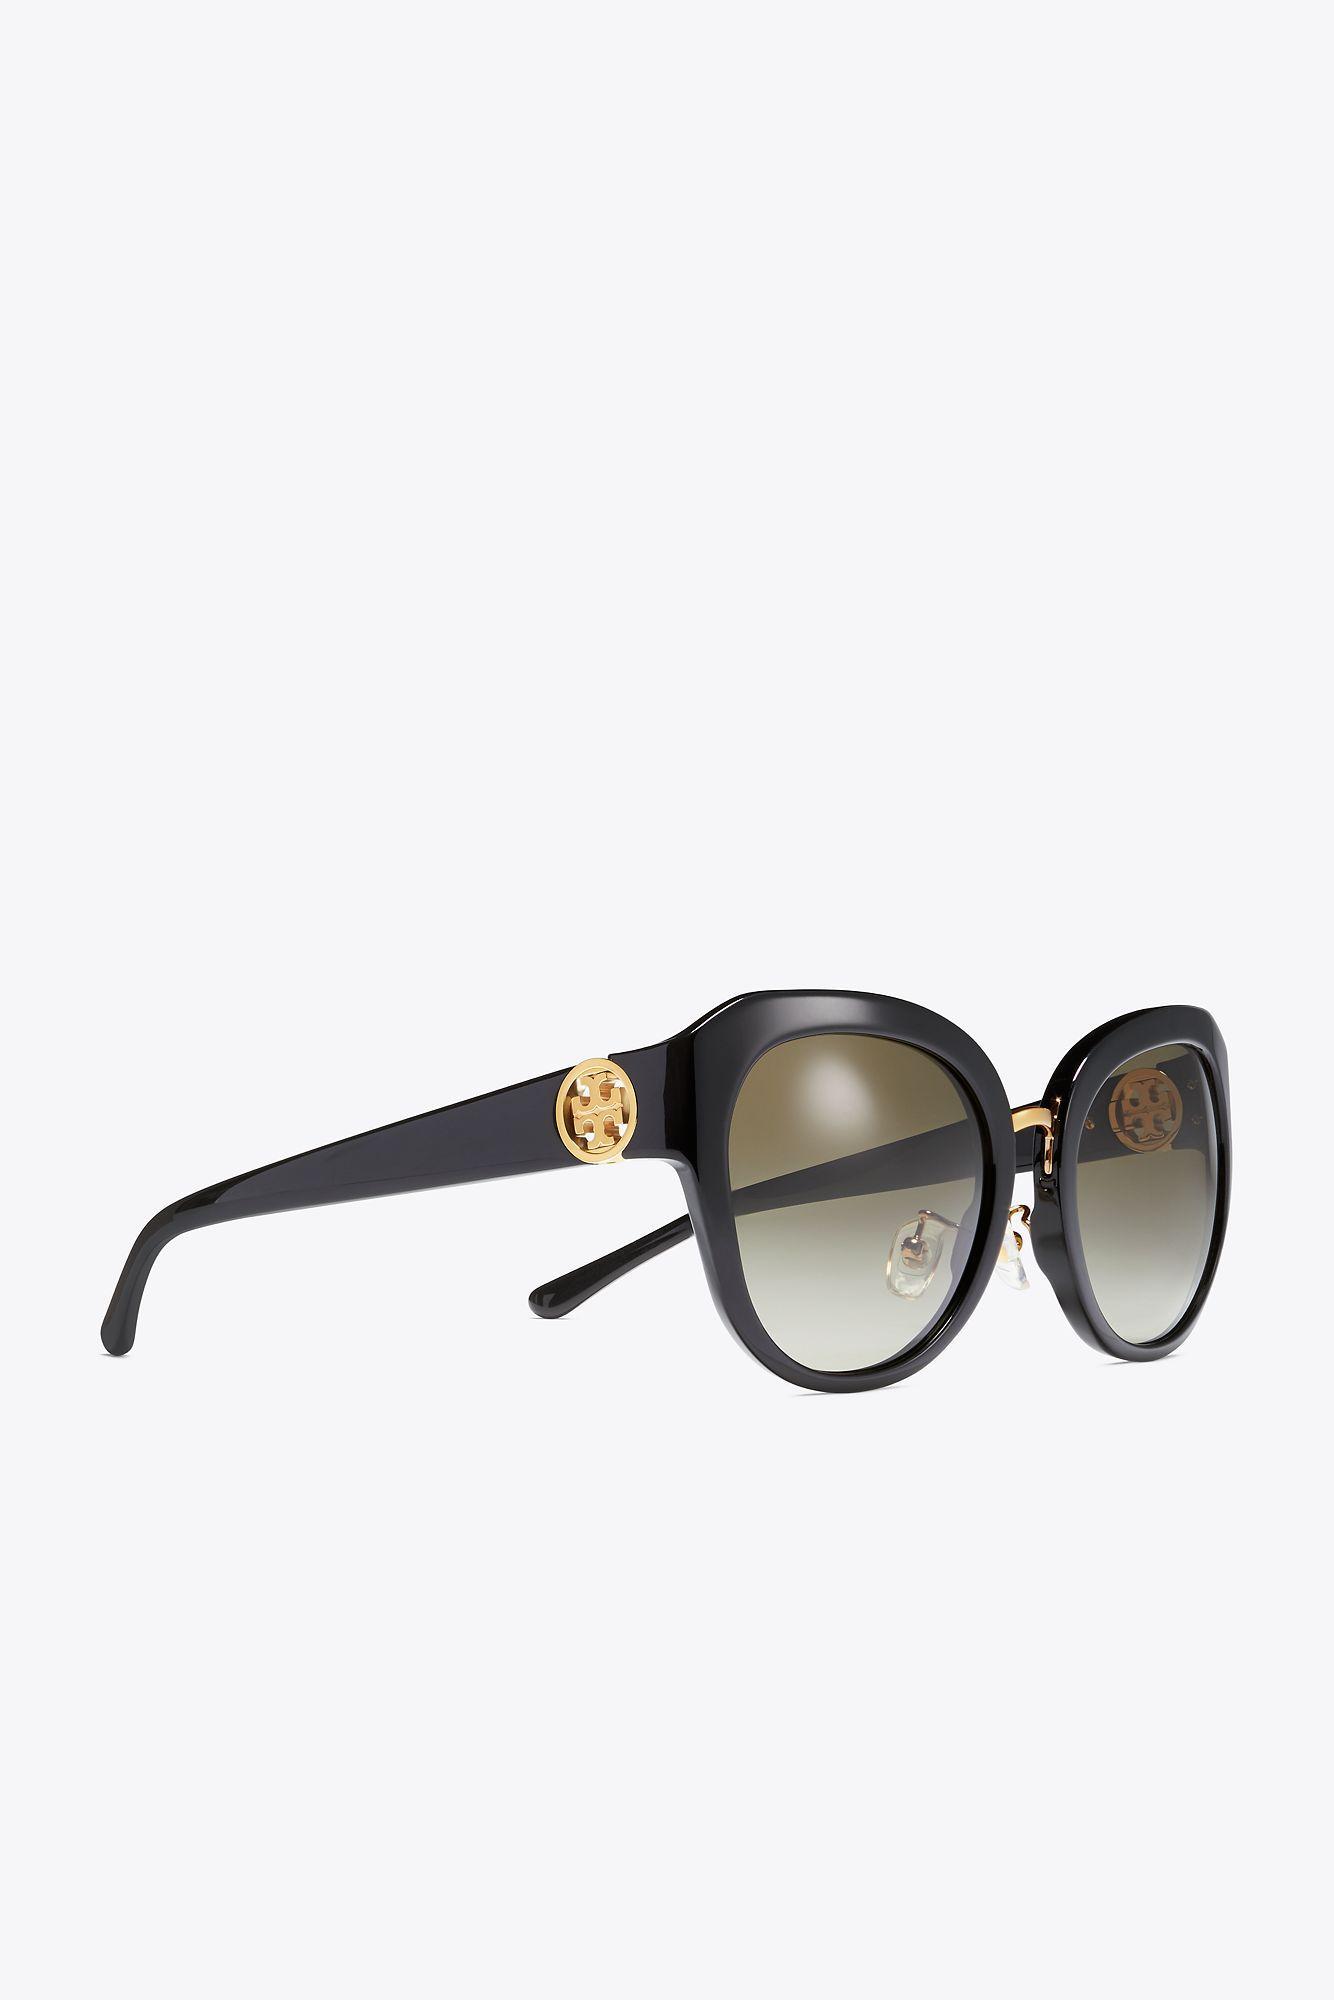 6614e1b6ff38 Lyst - Tory Burch 3 Piece Logo Irregular | 212 | Sunglasses in Black